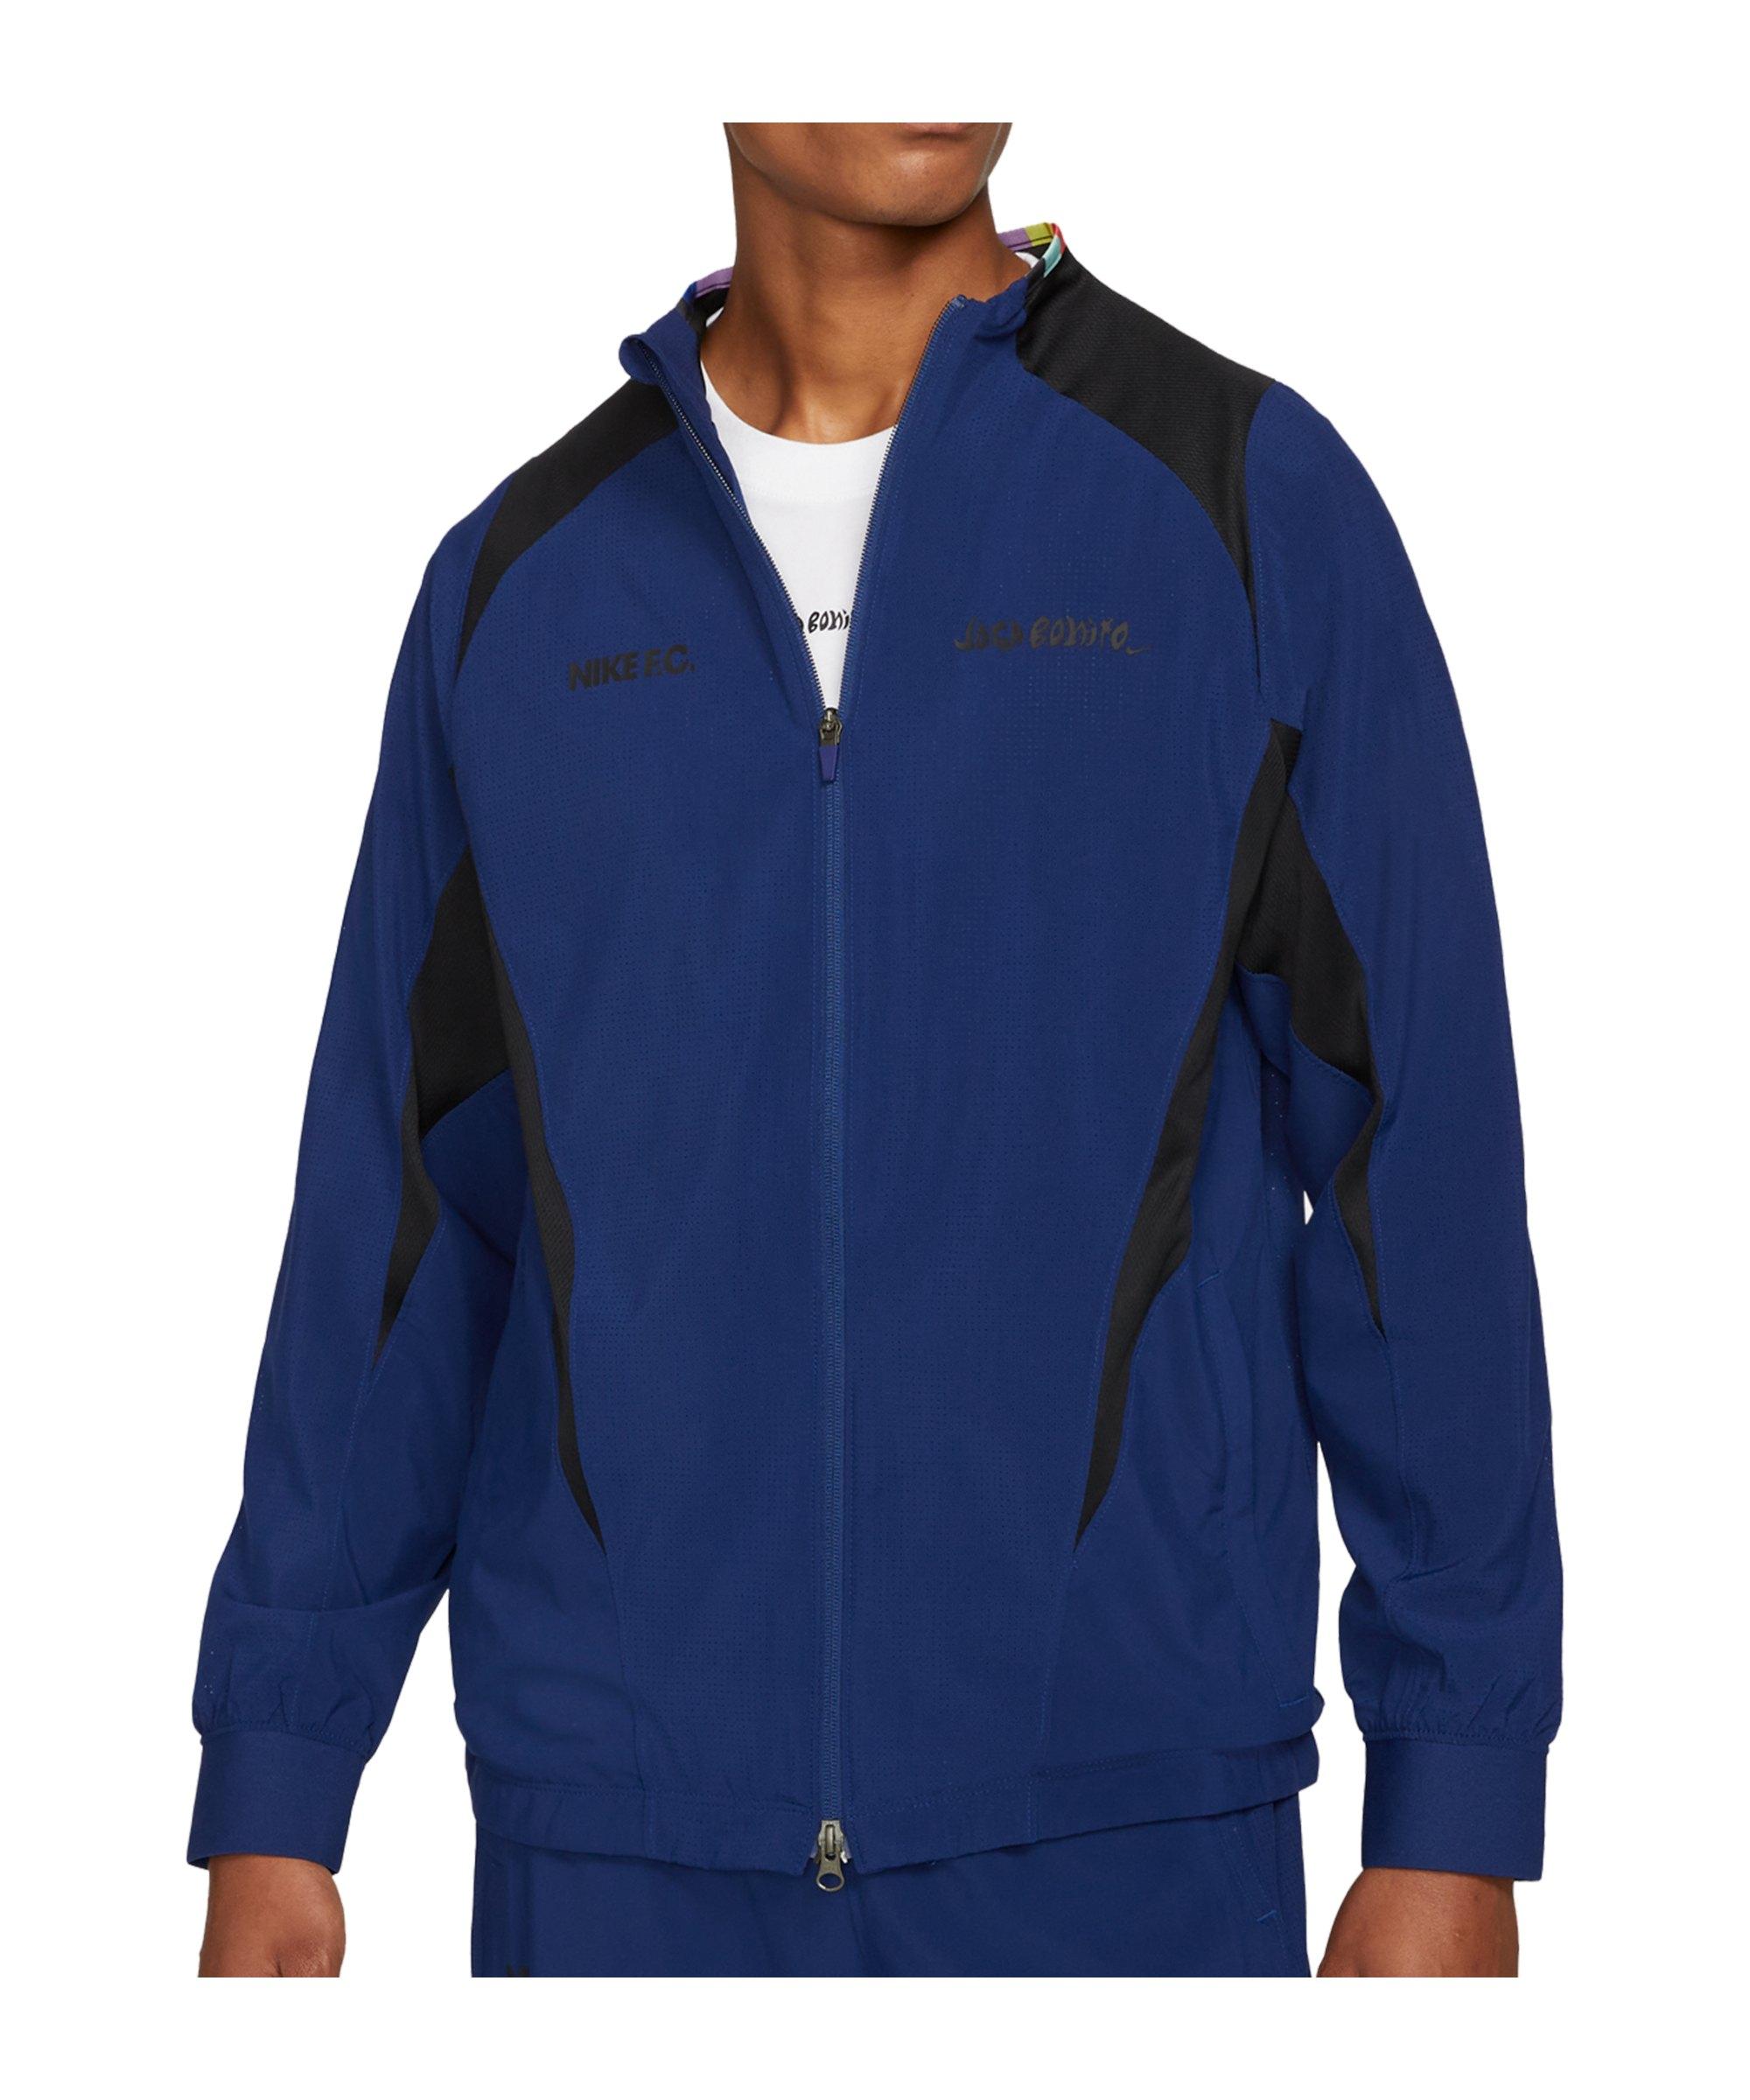 Nike F.C. Joga Bonito Woven Jacke Blau F492 - blau